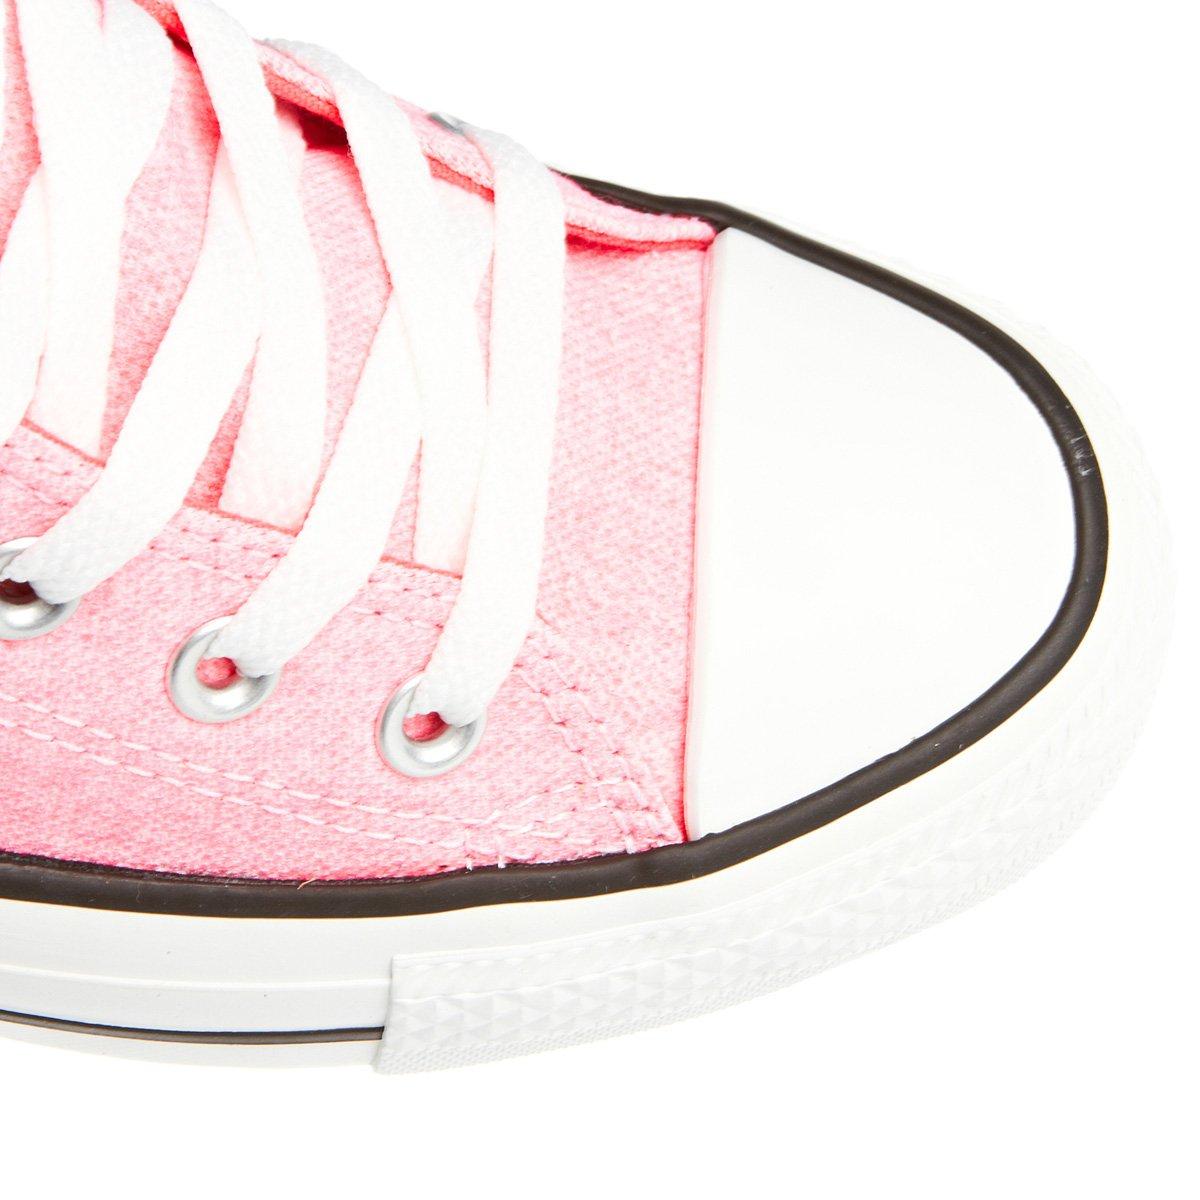 Converse Ctas Erwachsene Core Hi 015860-610-13, Unisex - Erwachsene Ctas Sneaker Neon Pink 1ba21a